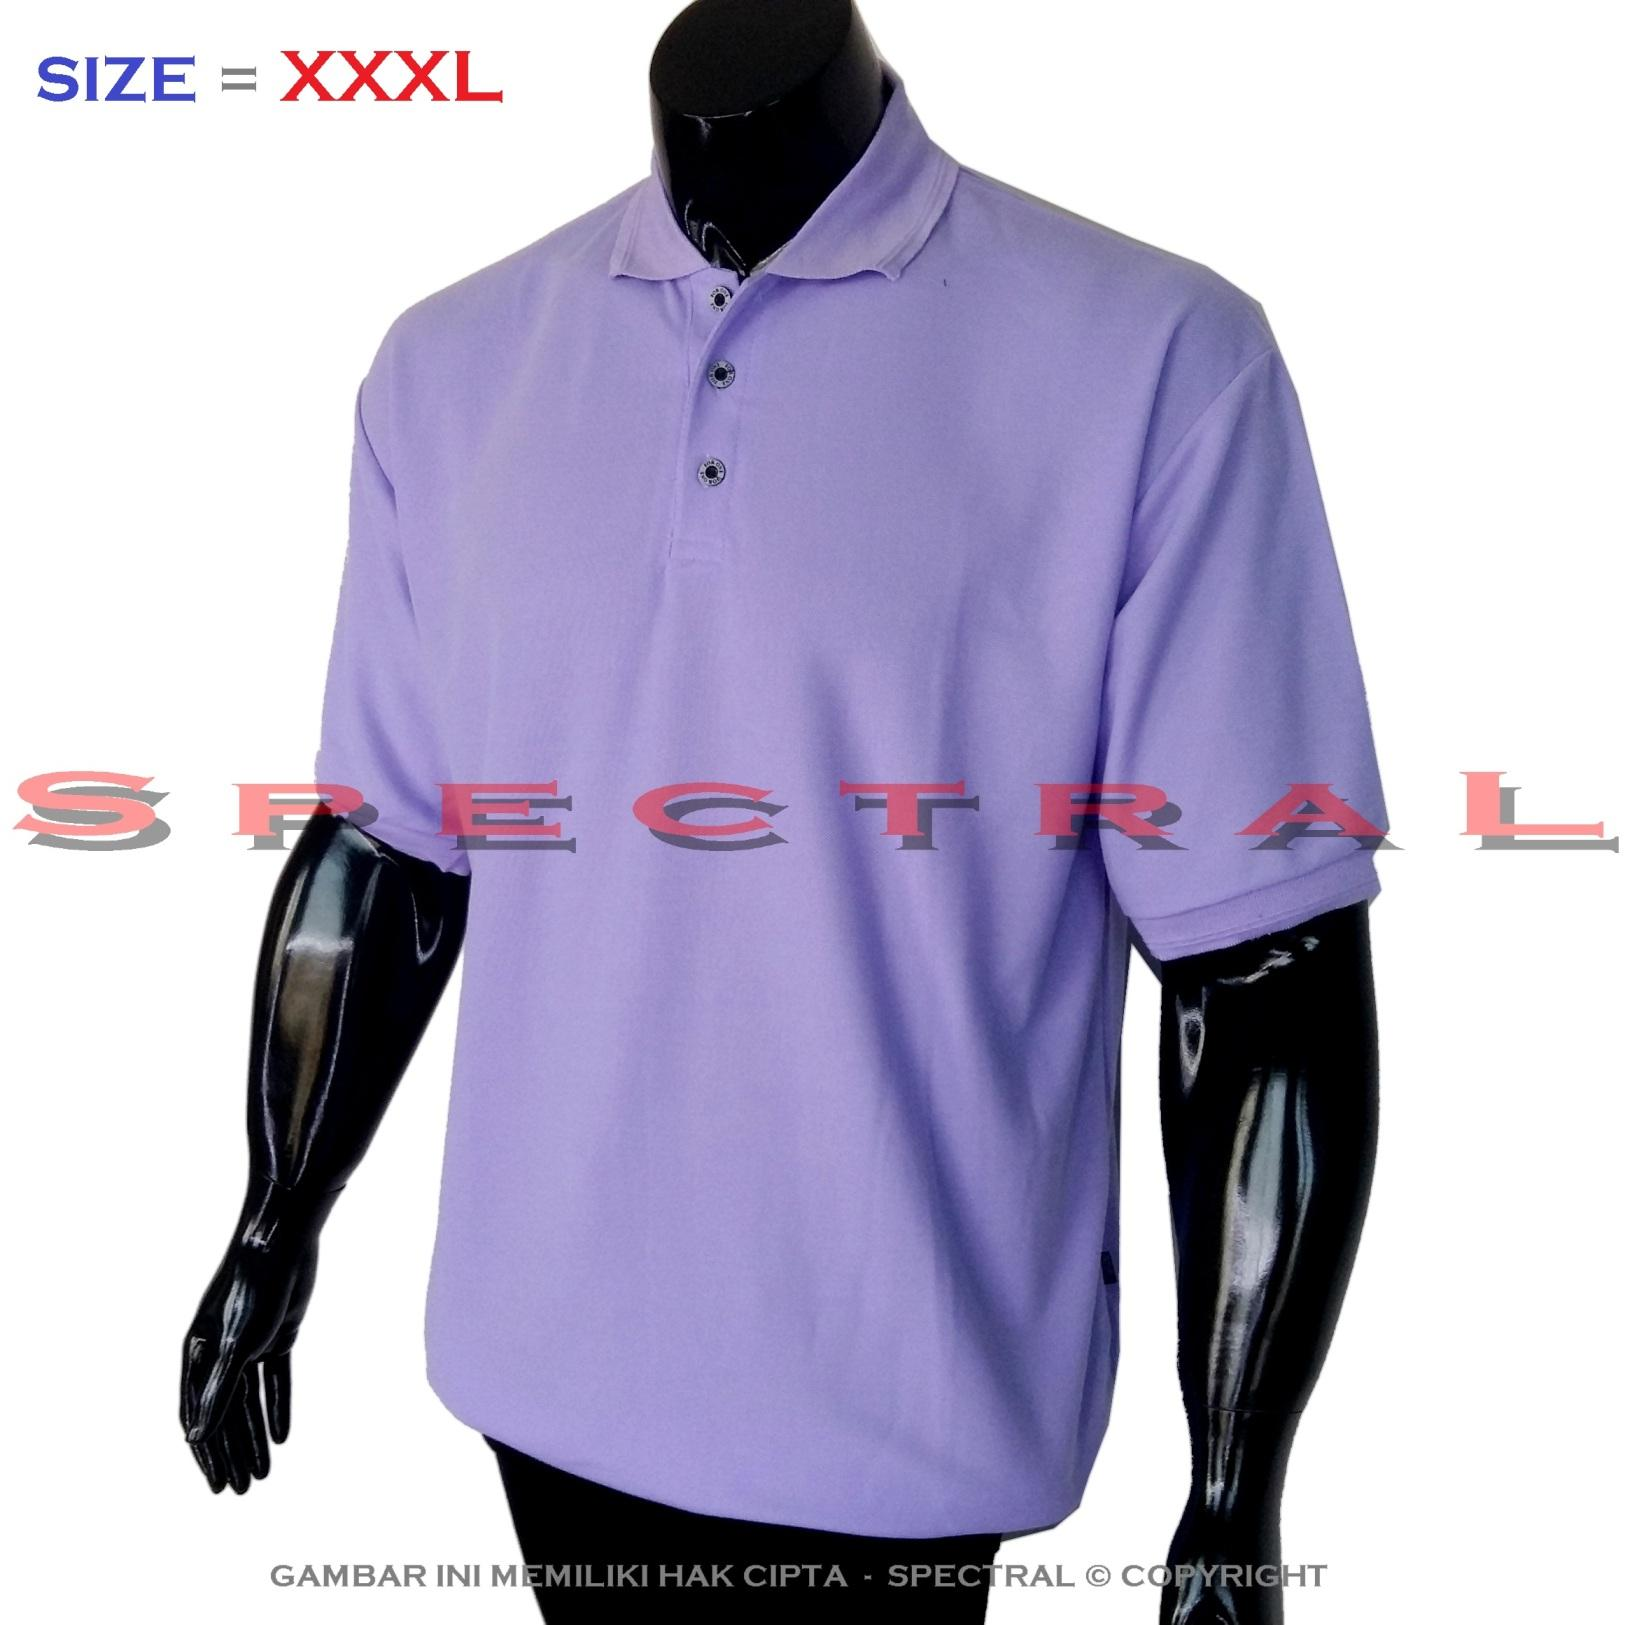 Spectral – Polo Shirt XXXL Ungu Lacos Kaos Distro Jumbo T-Shirt Fashion Ukuran Besar Polos Celana Olahraga Atasan Pria Wanita Dewasa Bapak Orang Tua Muda Terbaru Gemuk Gendut Sport Casual Bagus Keren Baju Cowo Cewe Pakaian 3L